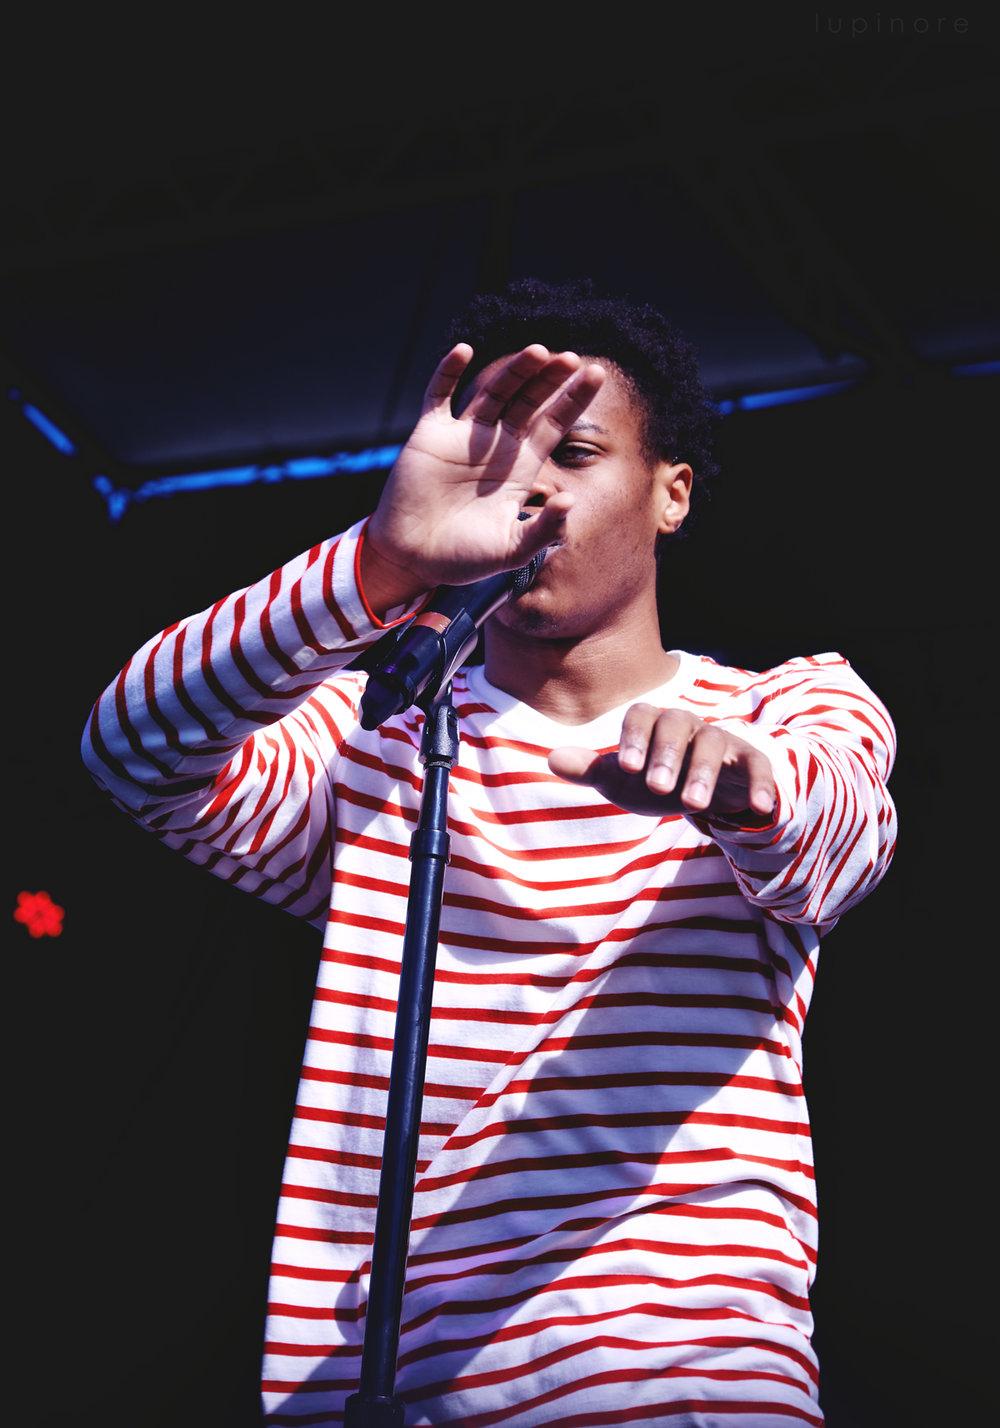 John_River_NXNE_Rap_Conscious